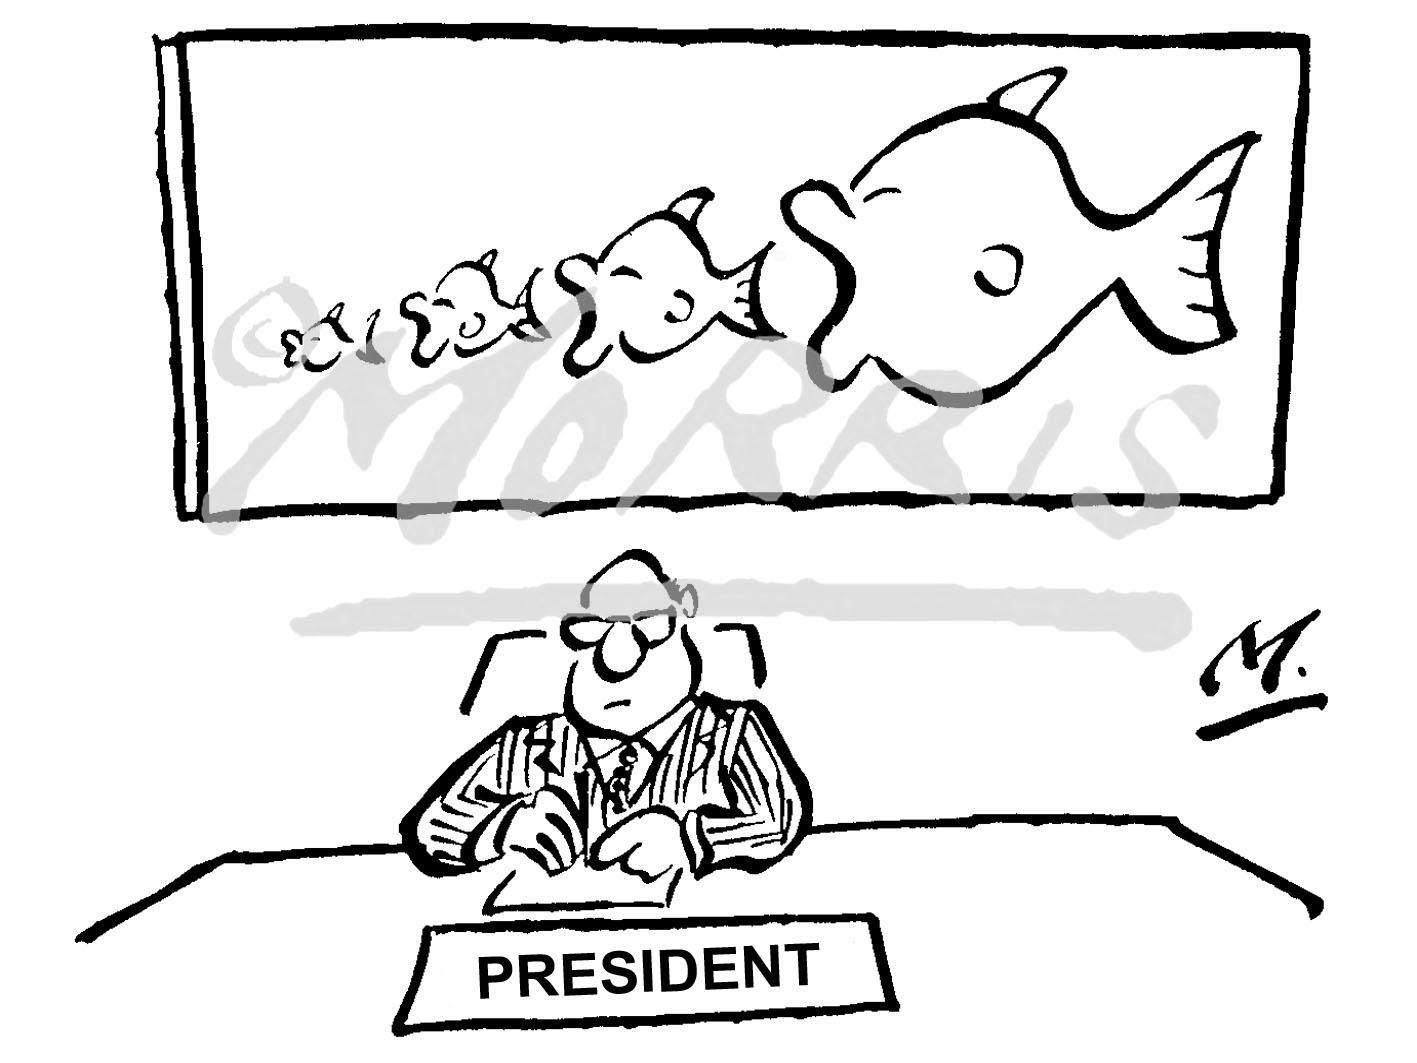 President takeover cartoon Ref: 1474bwus